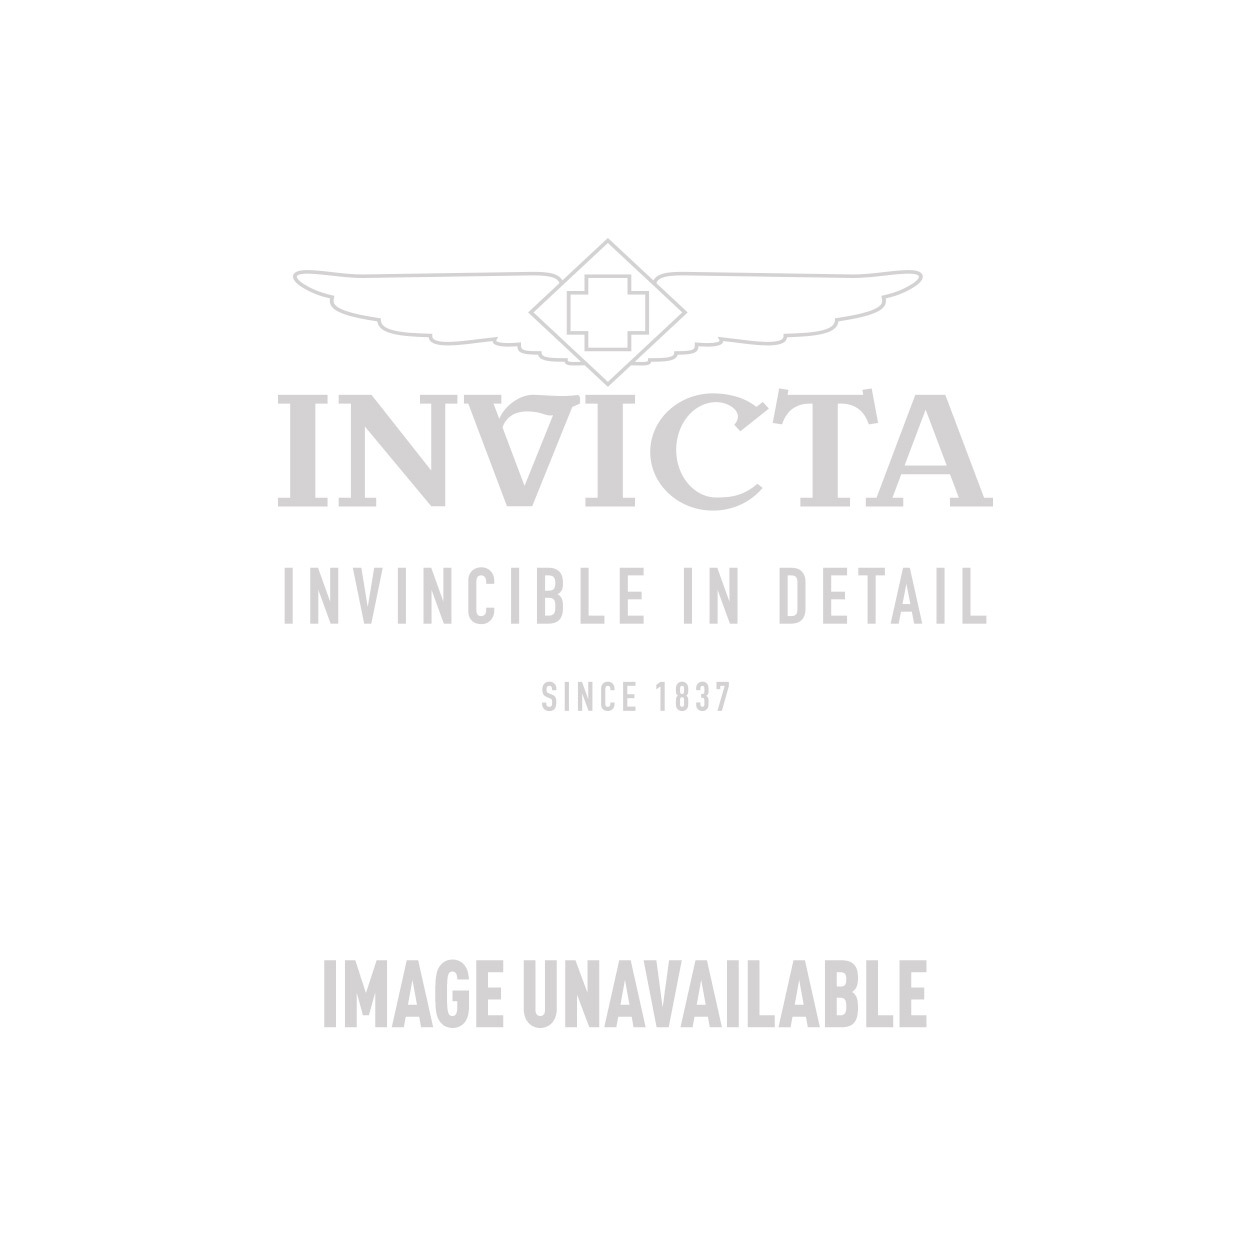 8ce4c7c4f Invicta Pro Diver SCUBA Mens Quartz 50mm Stainless Steel Case Blue Dial -  Model 22764 - Official Invicta Store